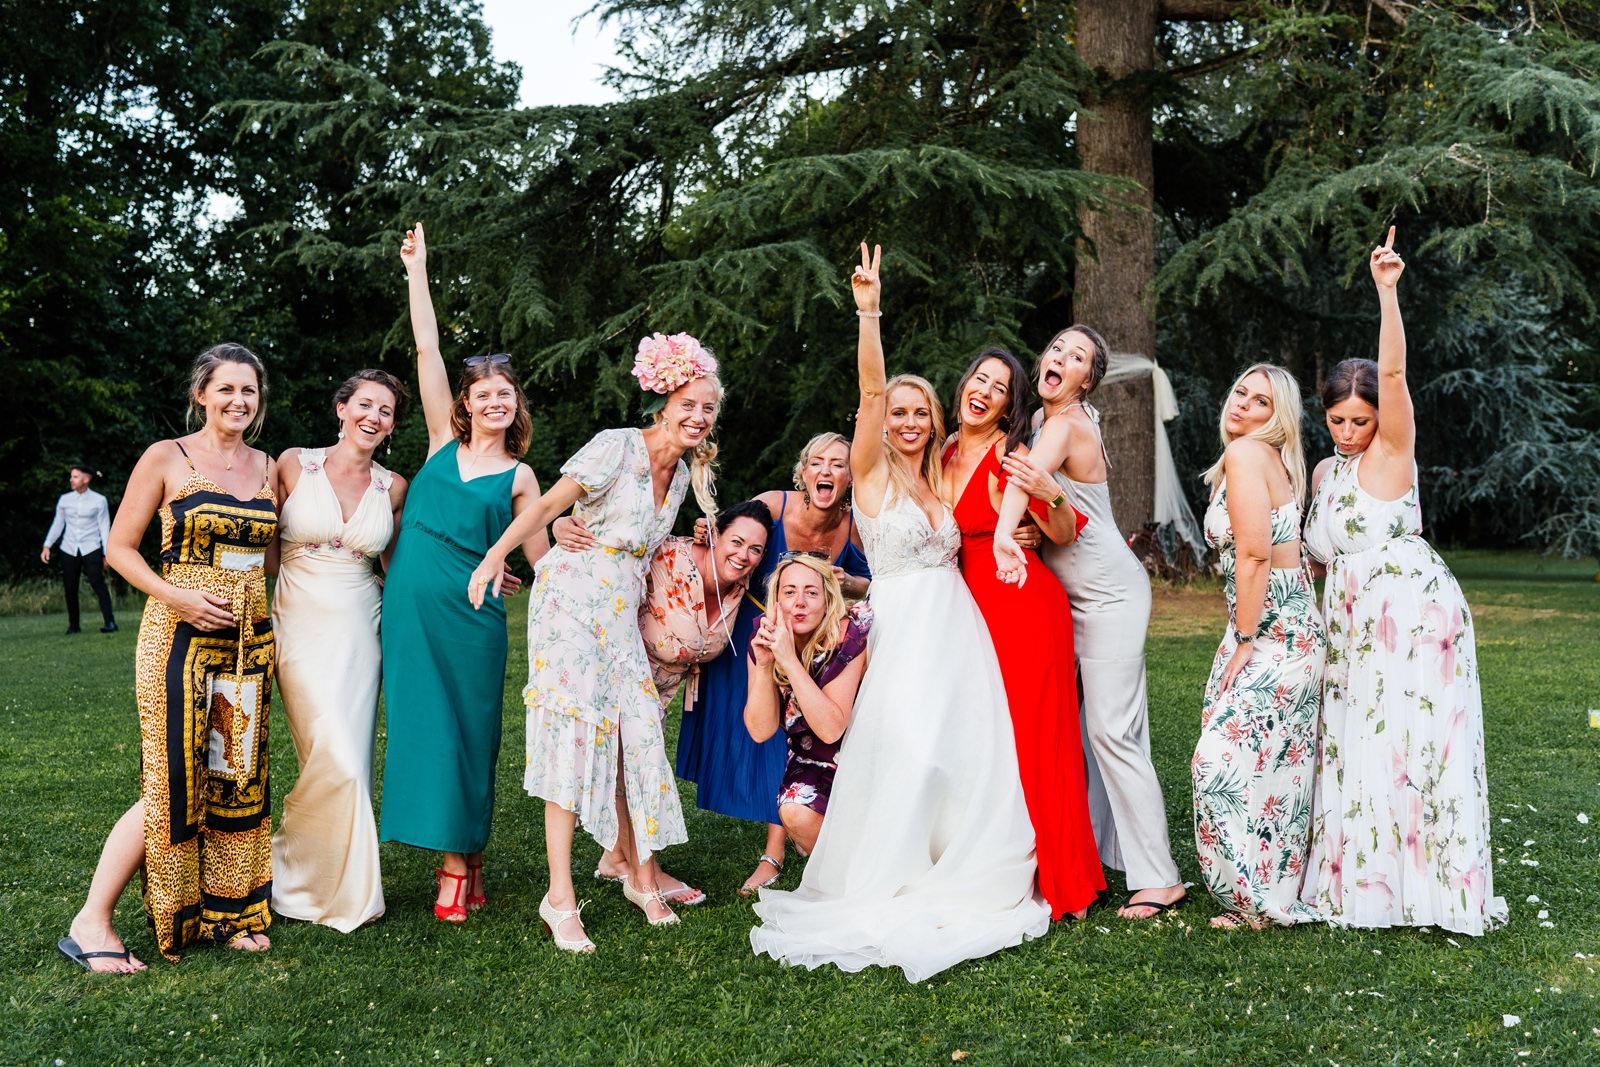 brides friends informal group photo